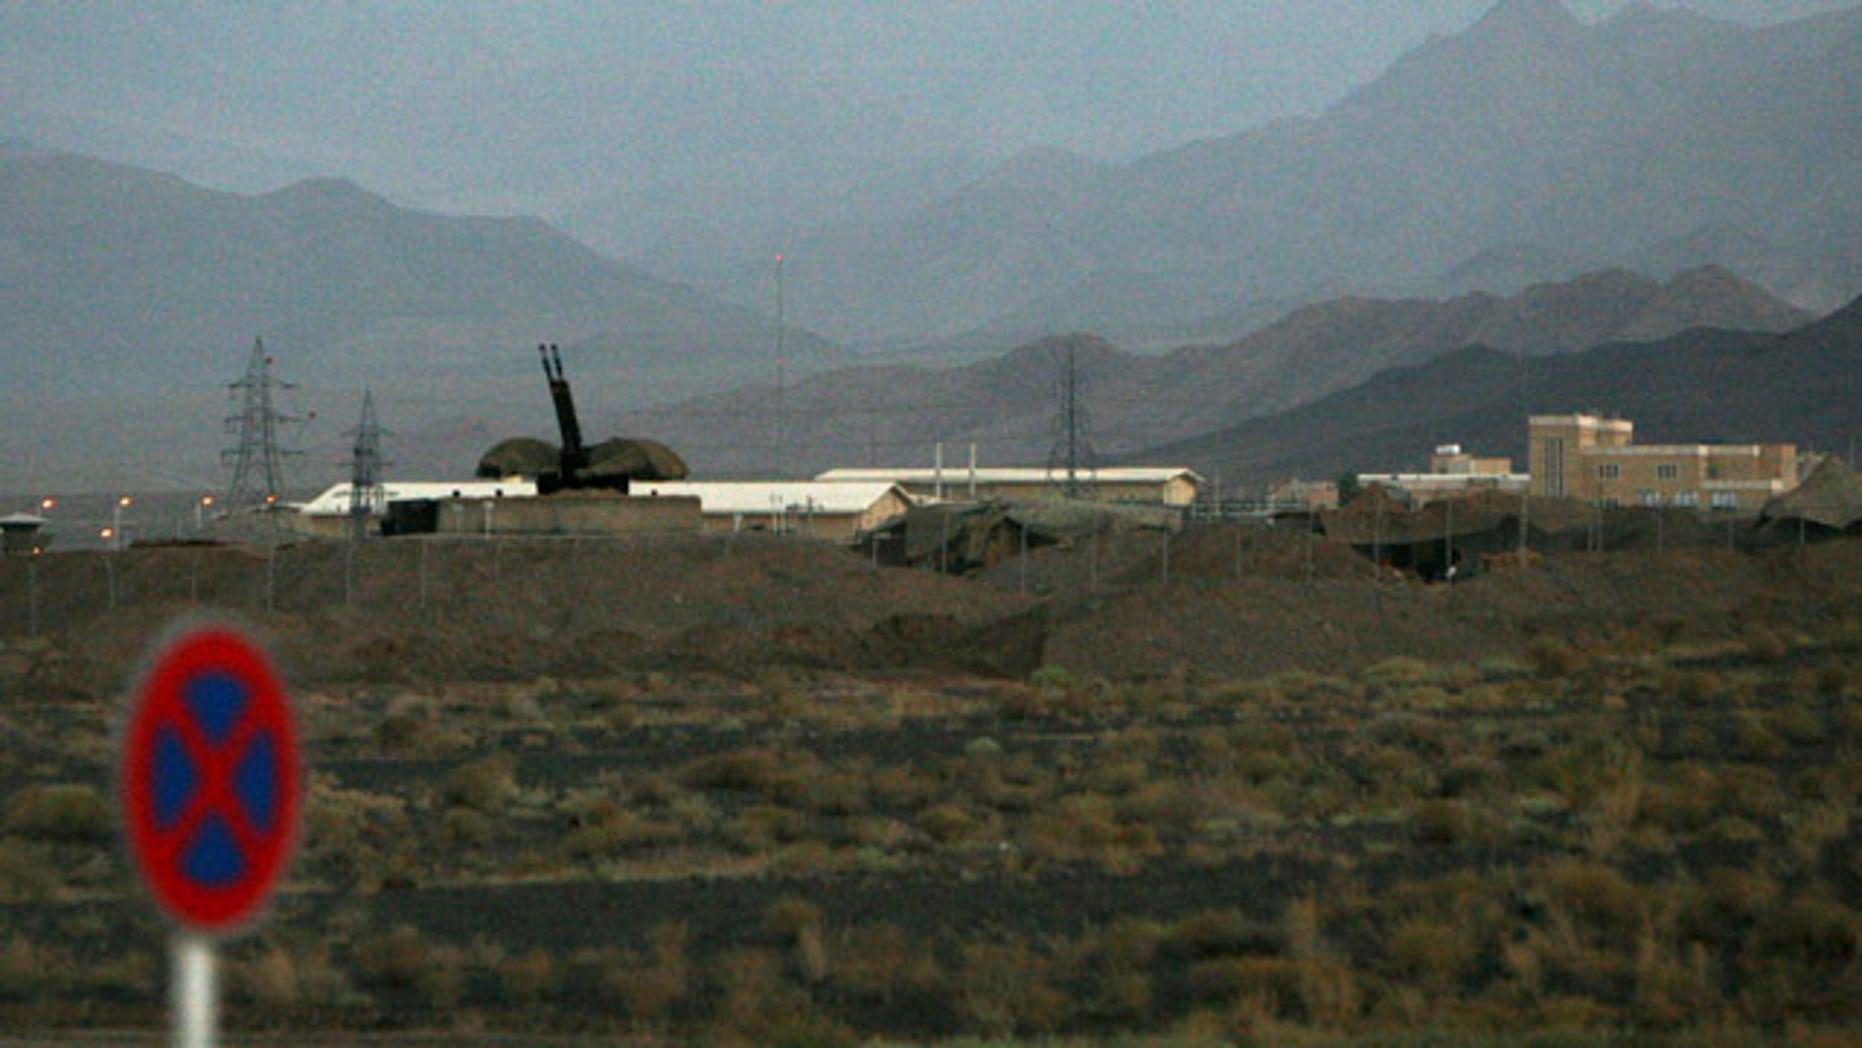 FILE 2007: An anti-aircraft gun position is seen at Iran's nuclear enrichment facility in Natanz, Iran.